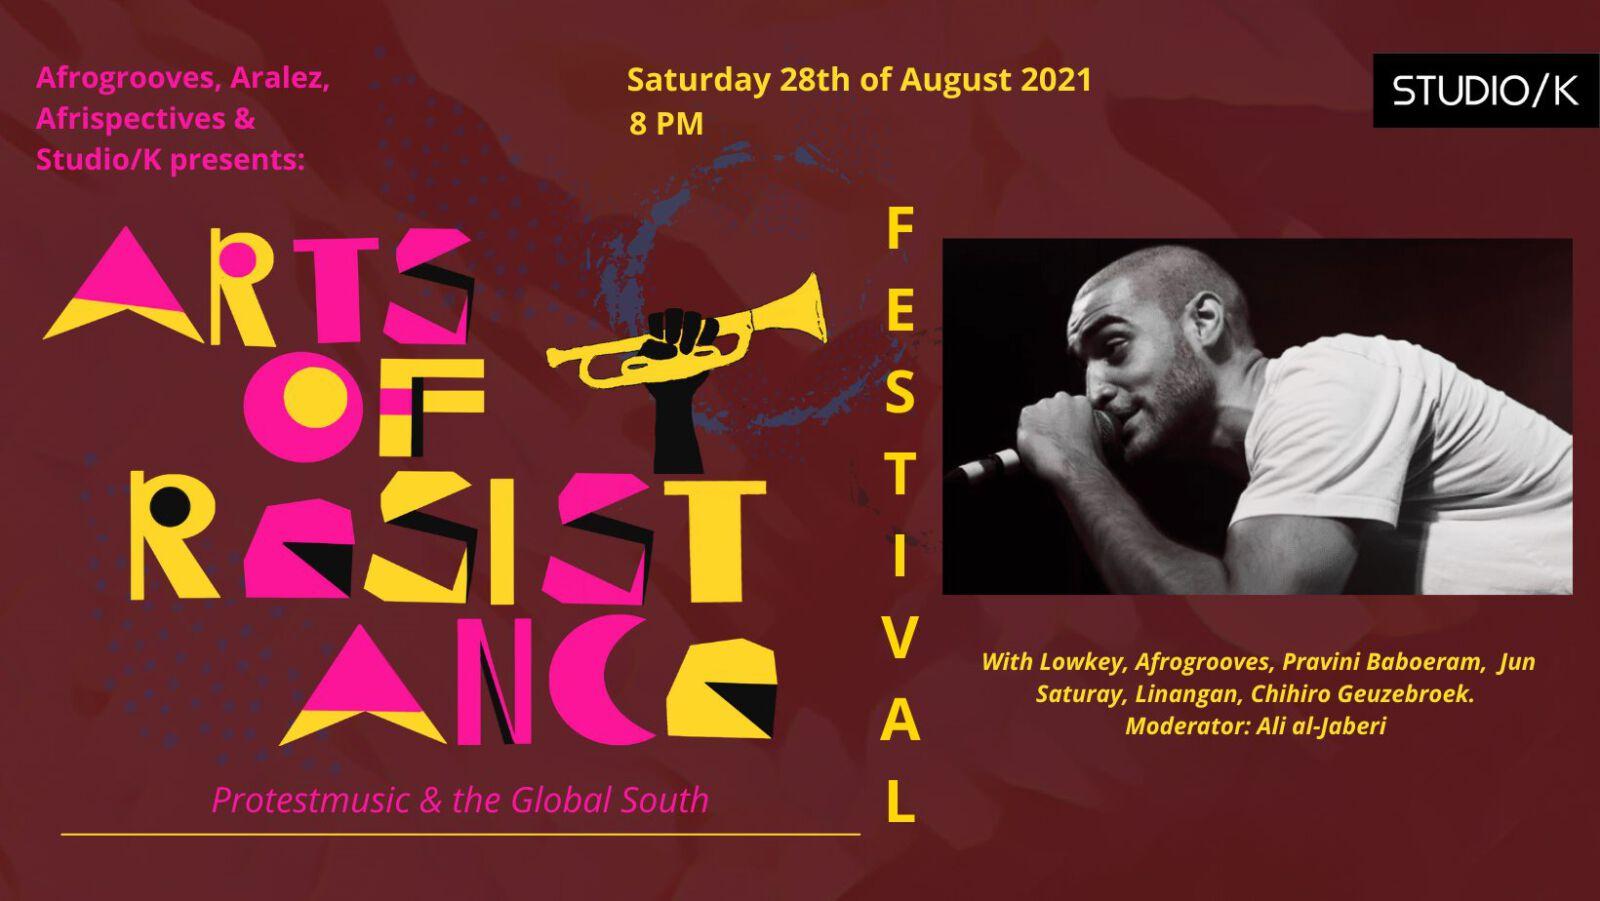 /K invites: Arts of Resistance Festival